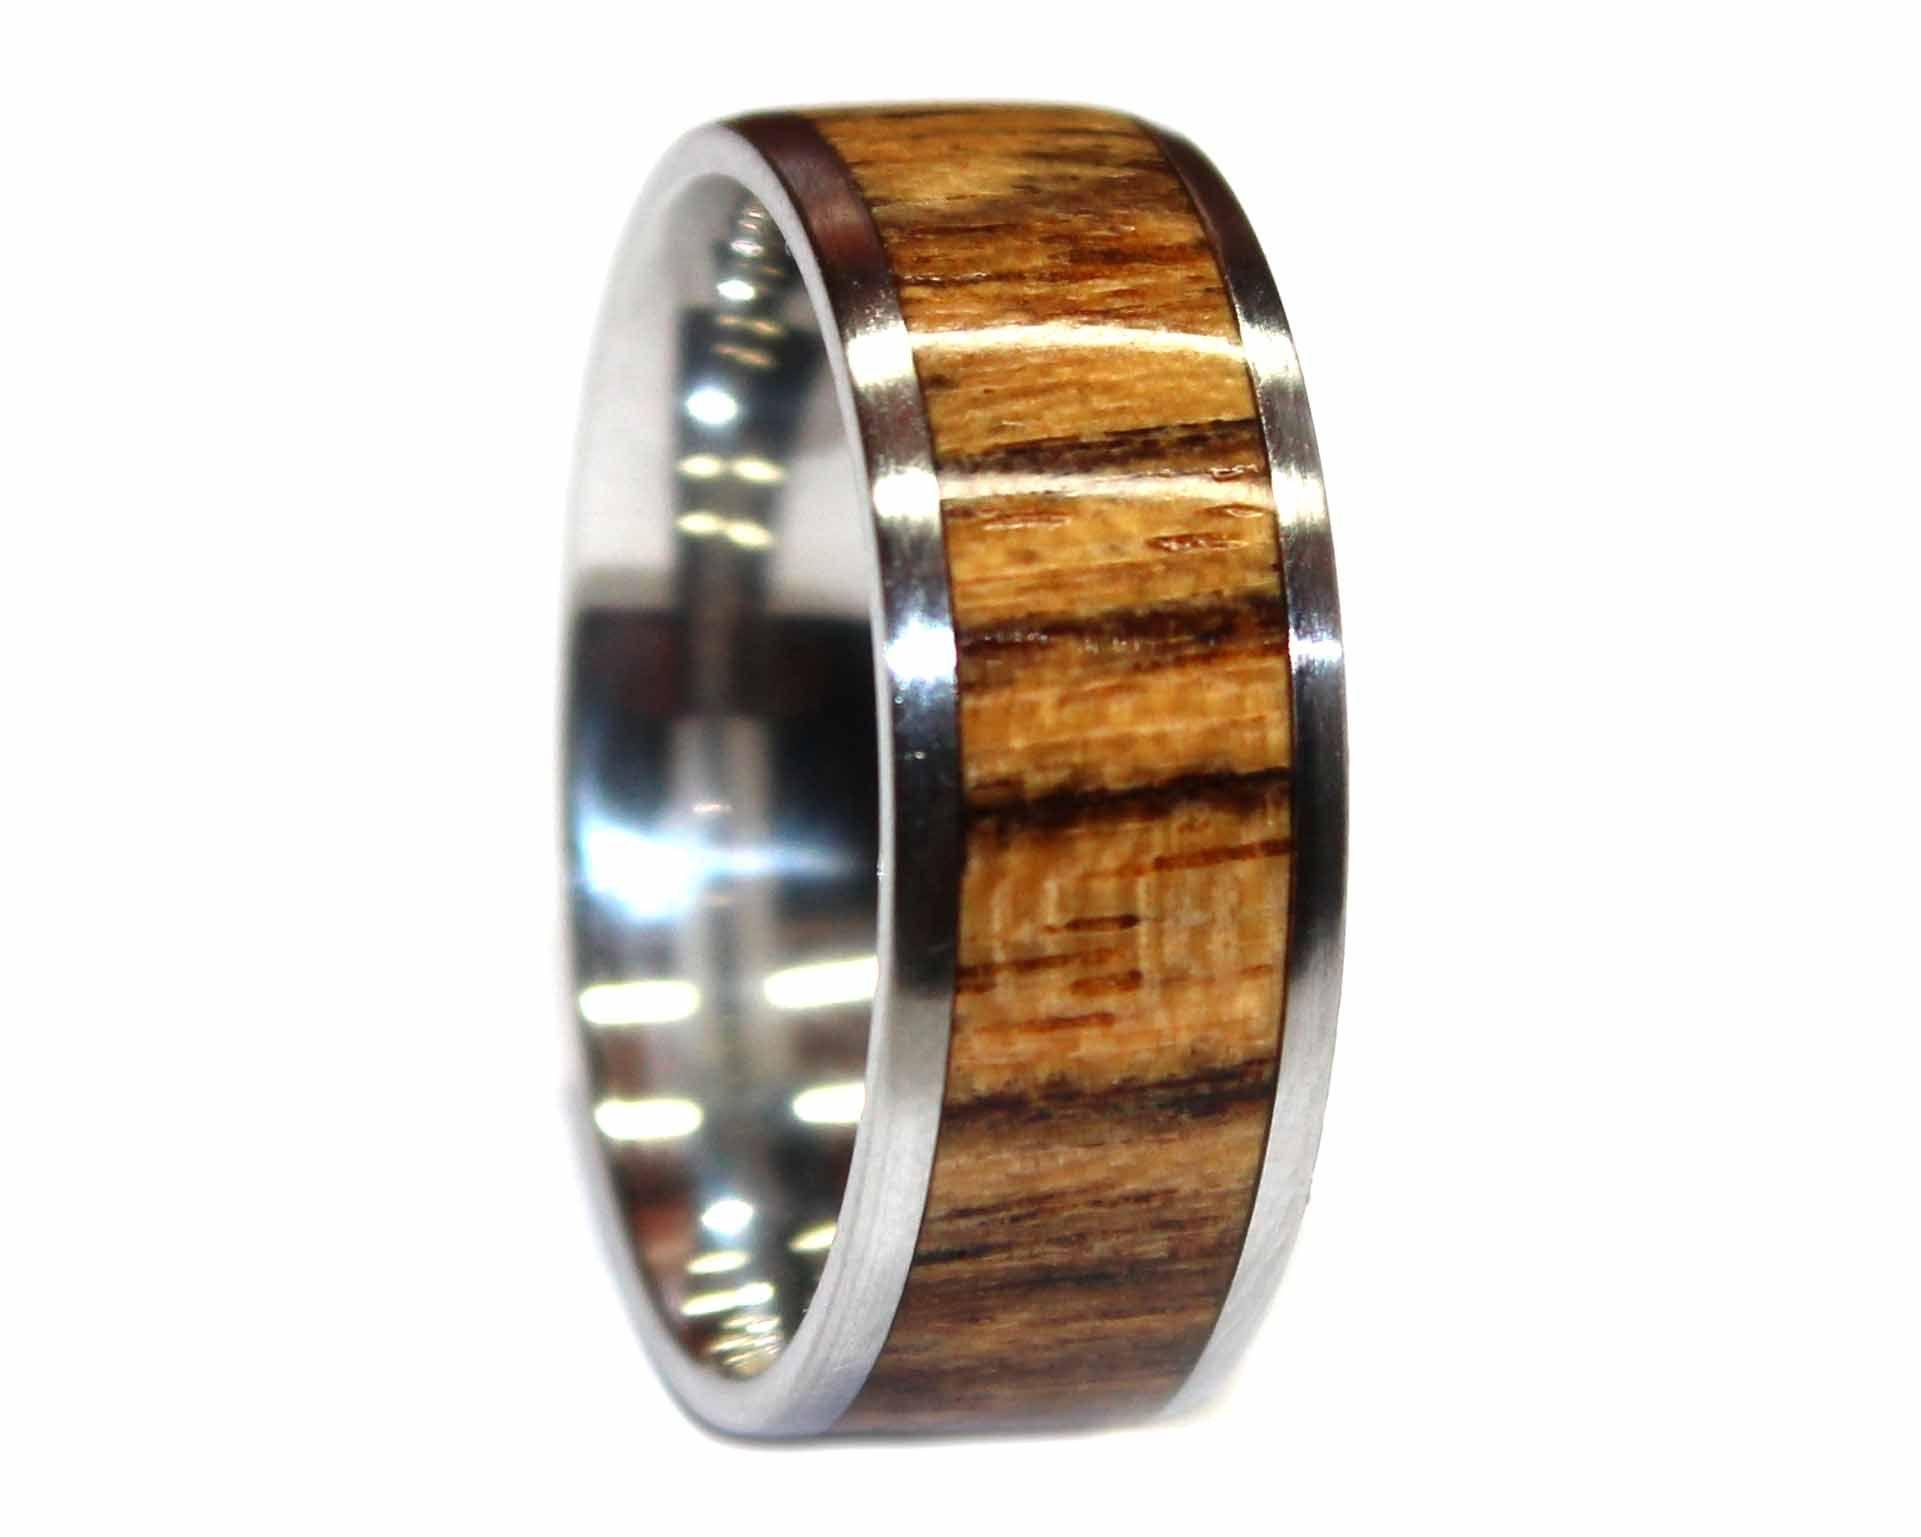 Cocobolo Bocote Mens Wedding Band Unique Mens Ring Engagement RIng Artisian